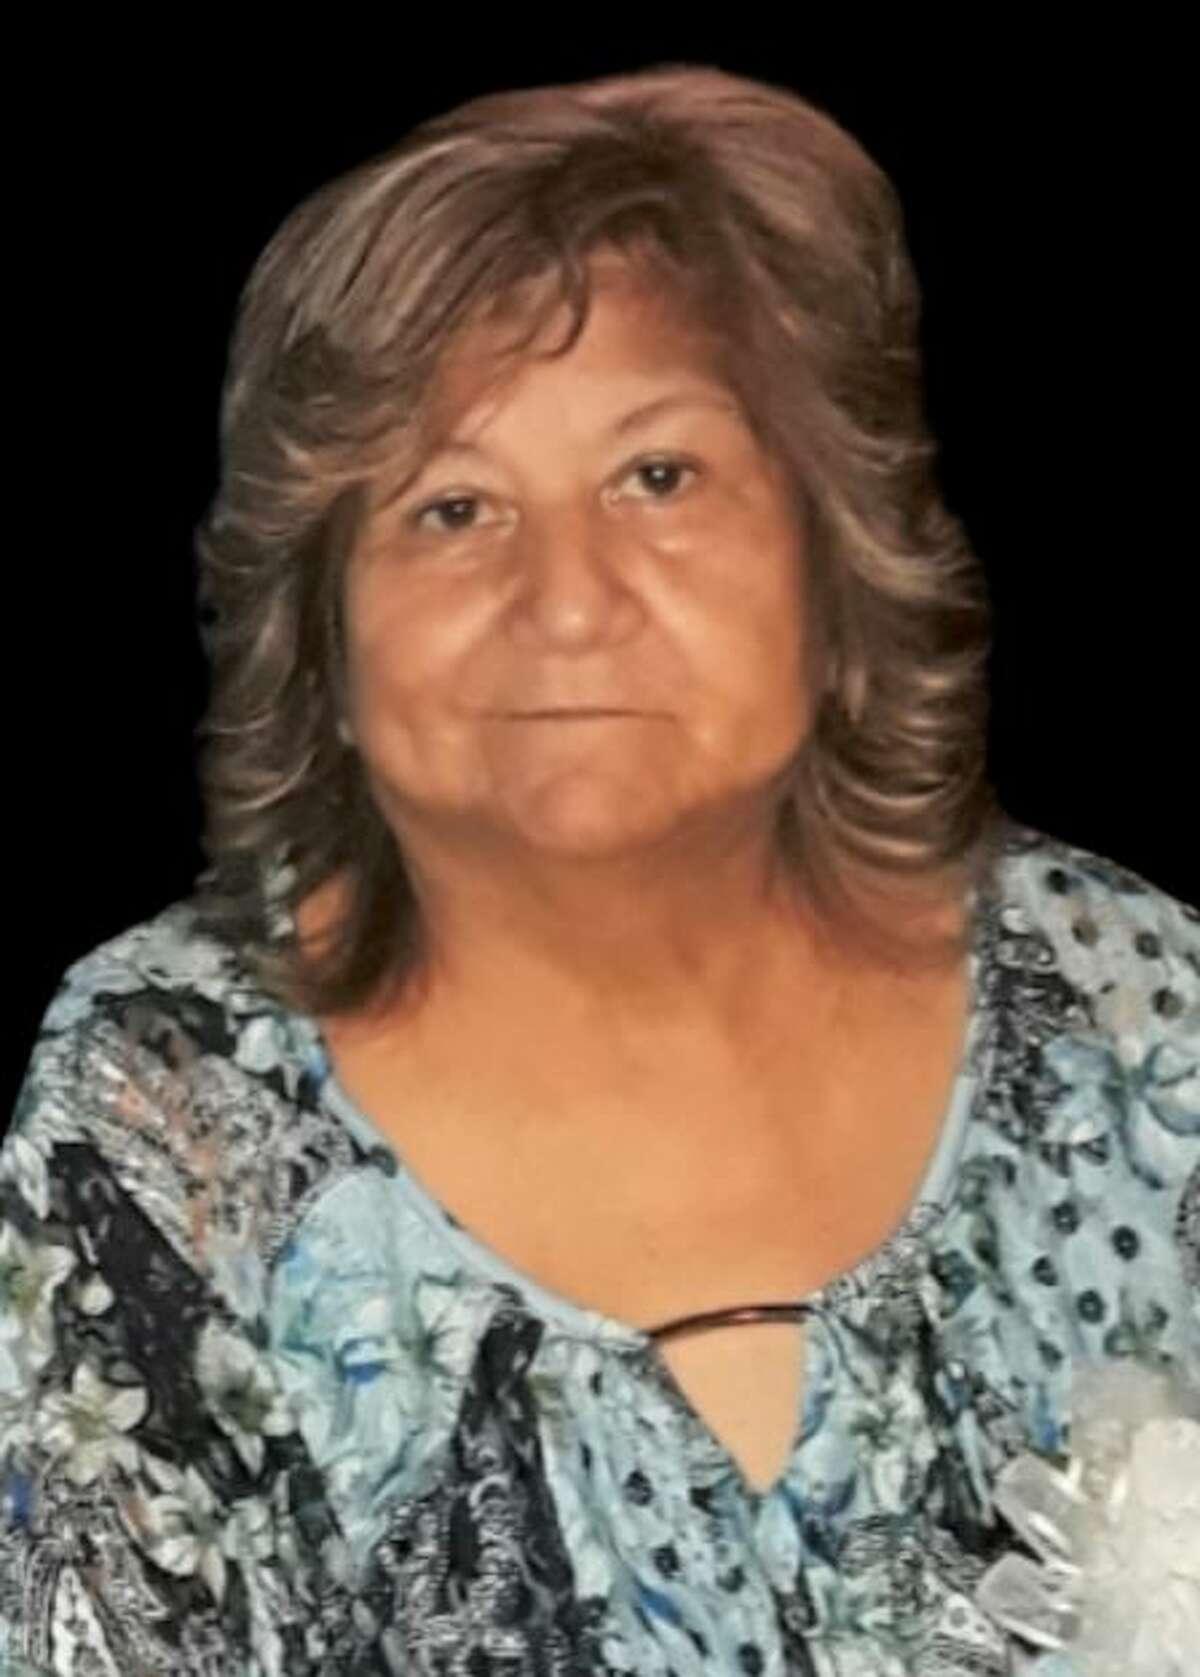 Dalia Diana Bondoc